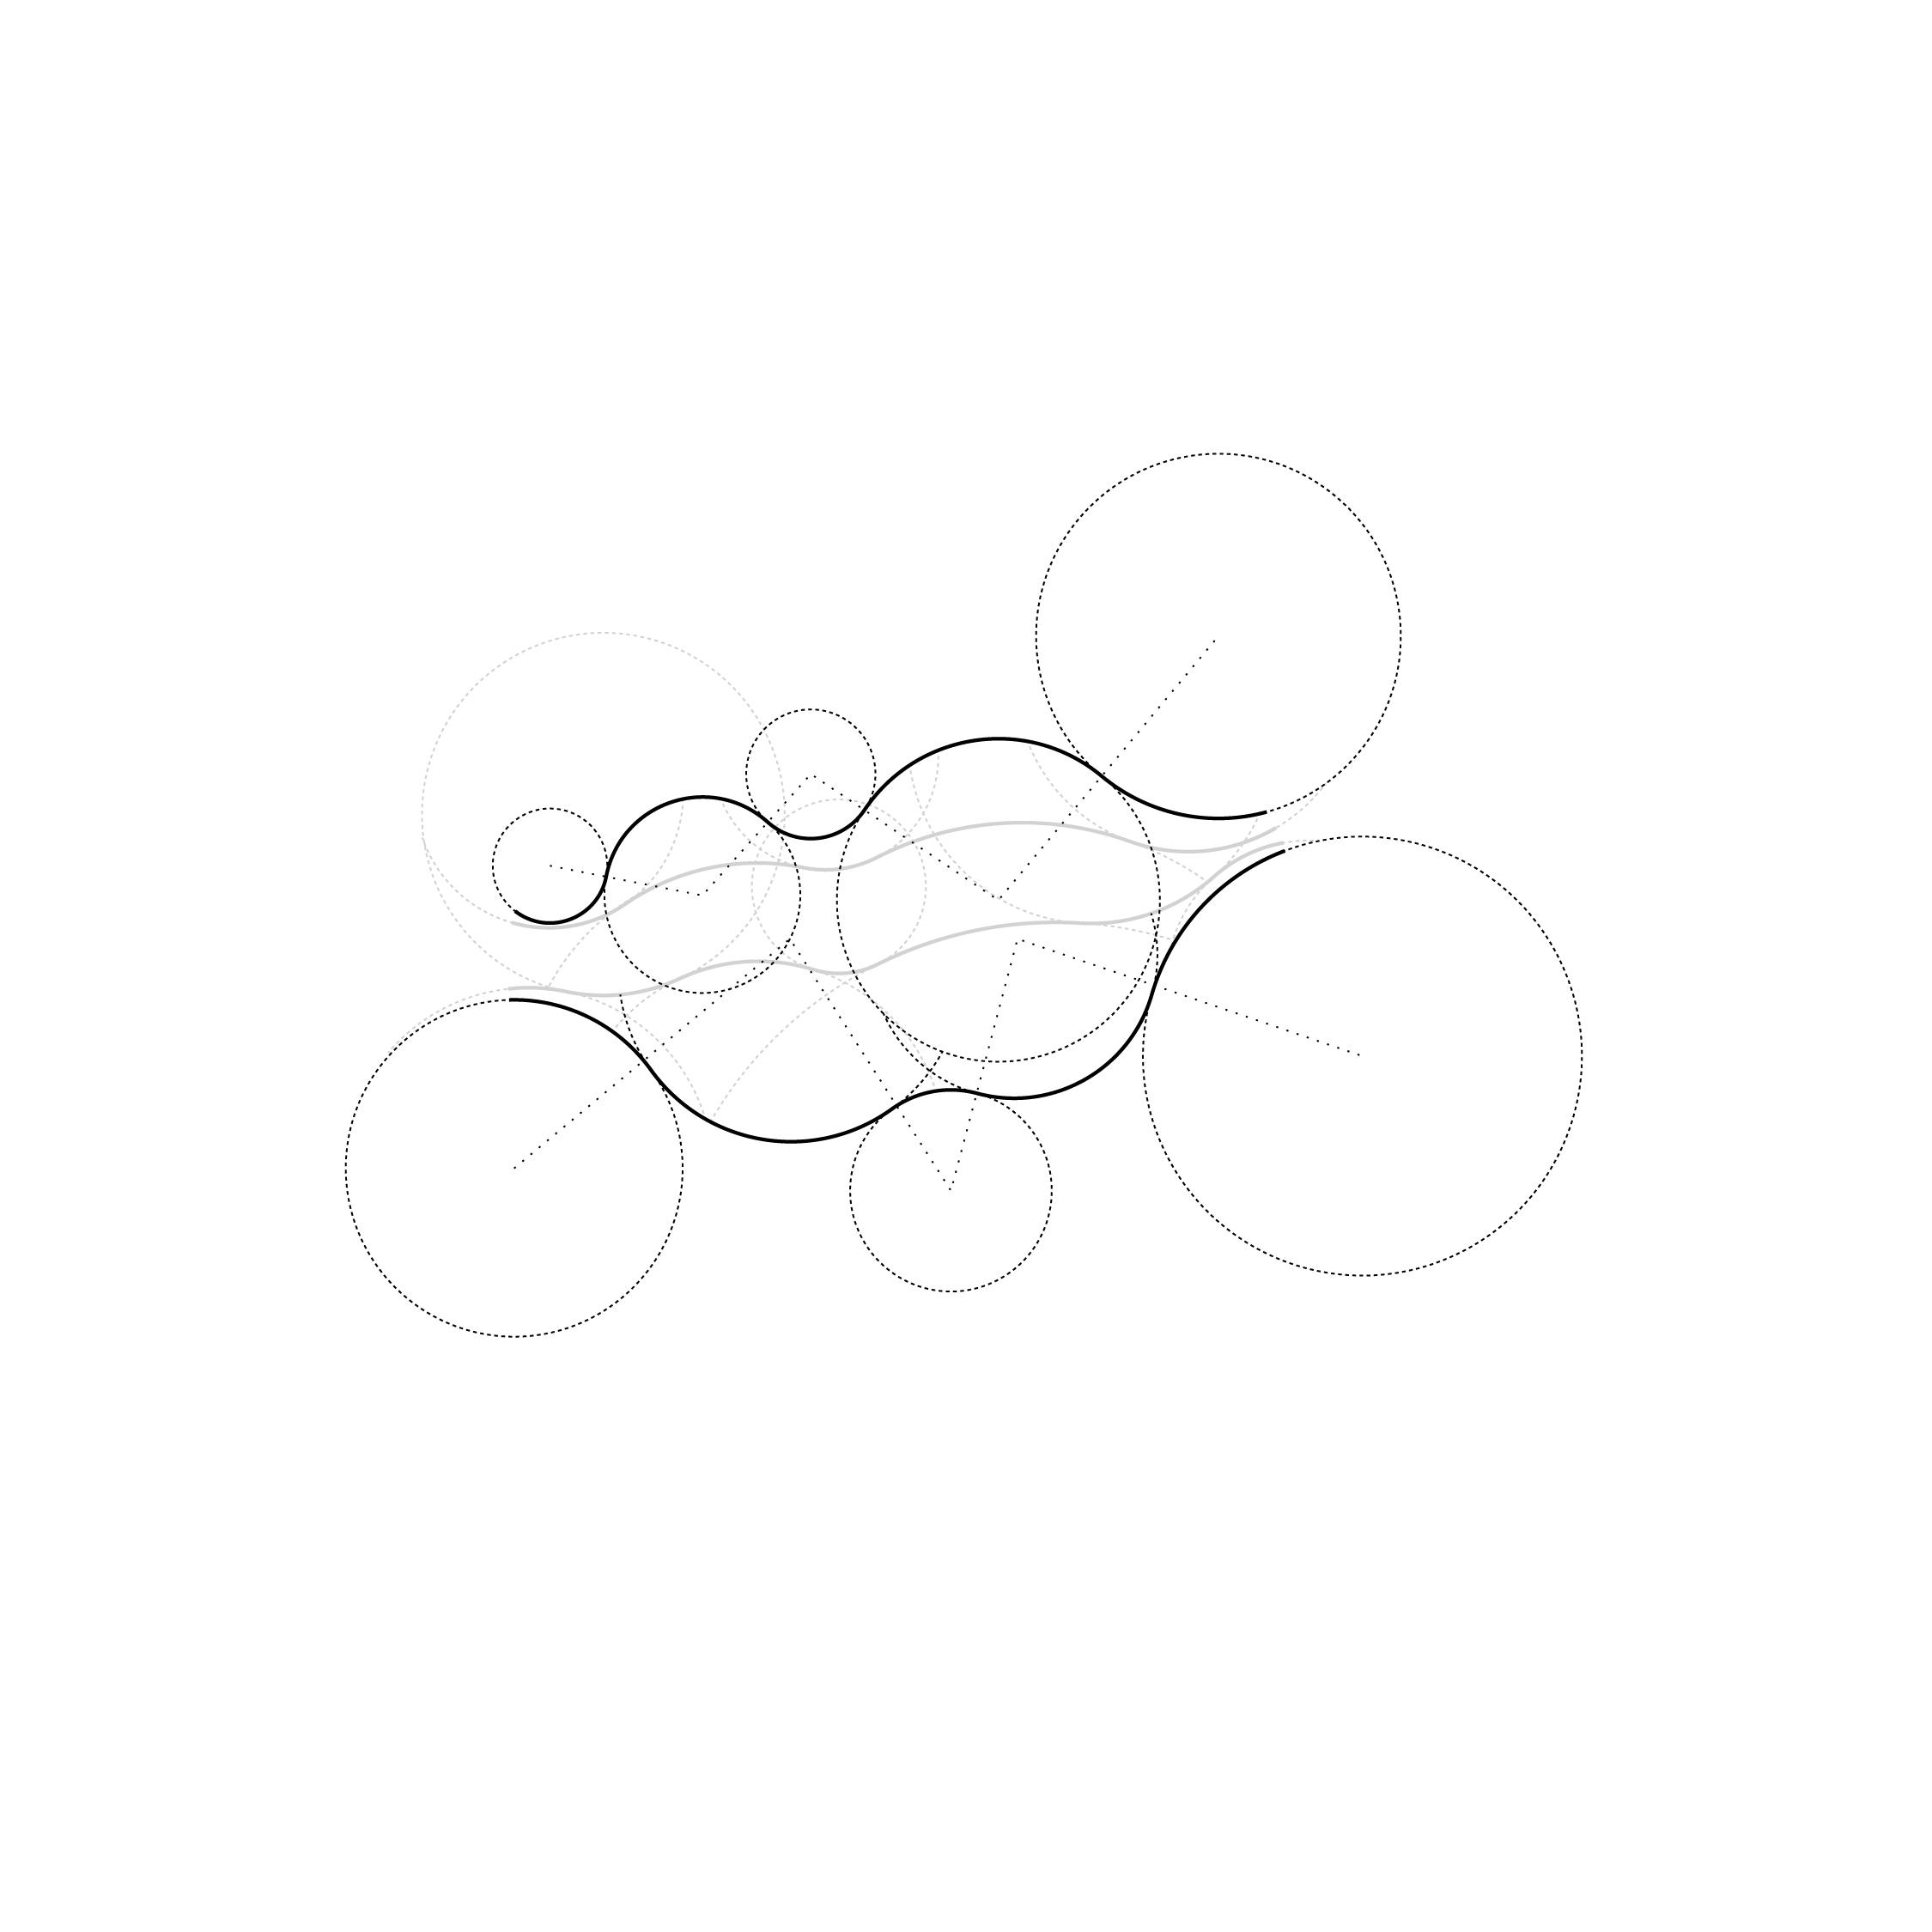 140913 eye-lips circle anayisys-05.jpg